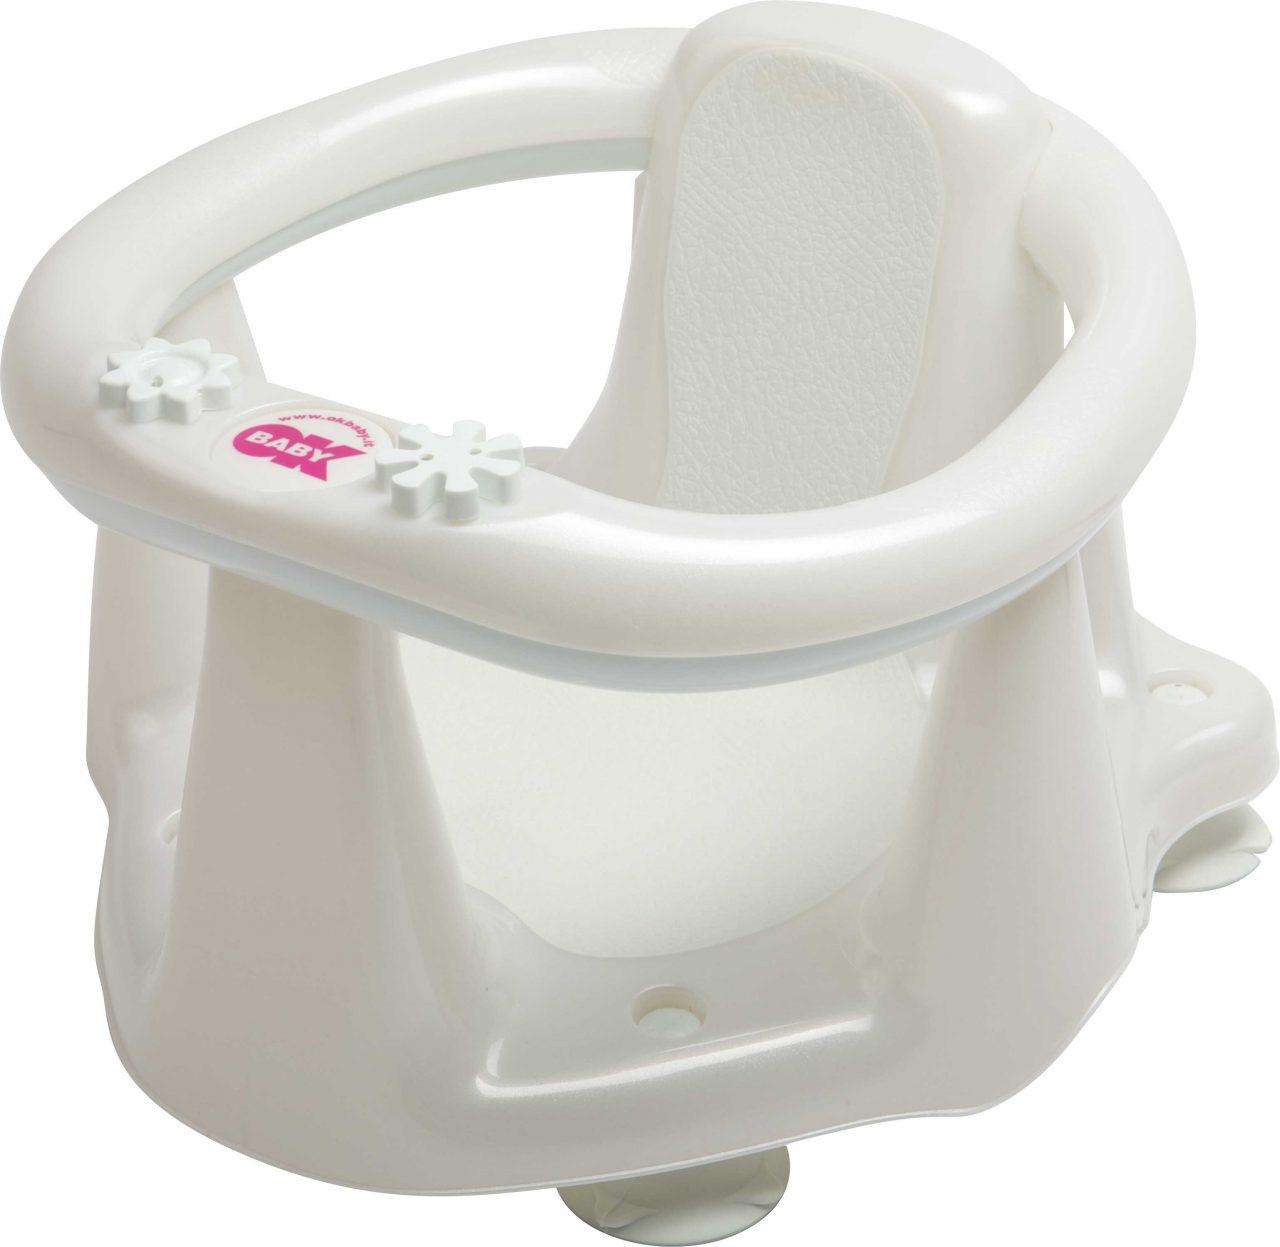 Bath ring Flipper Evolution Pearl white